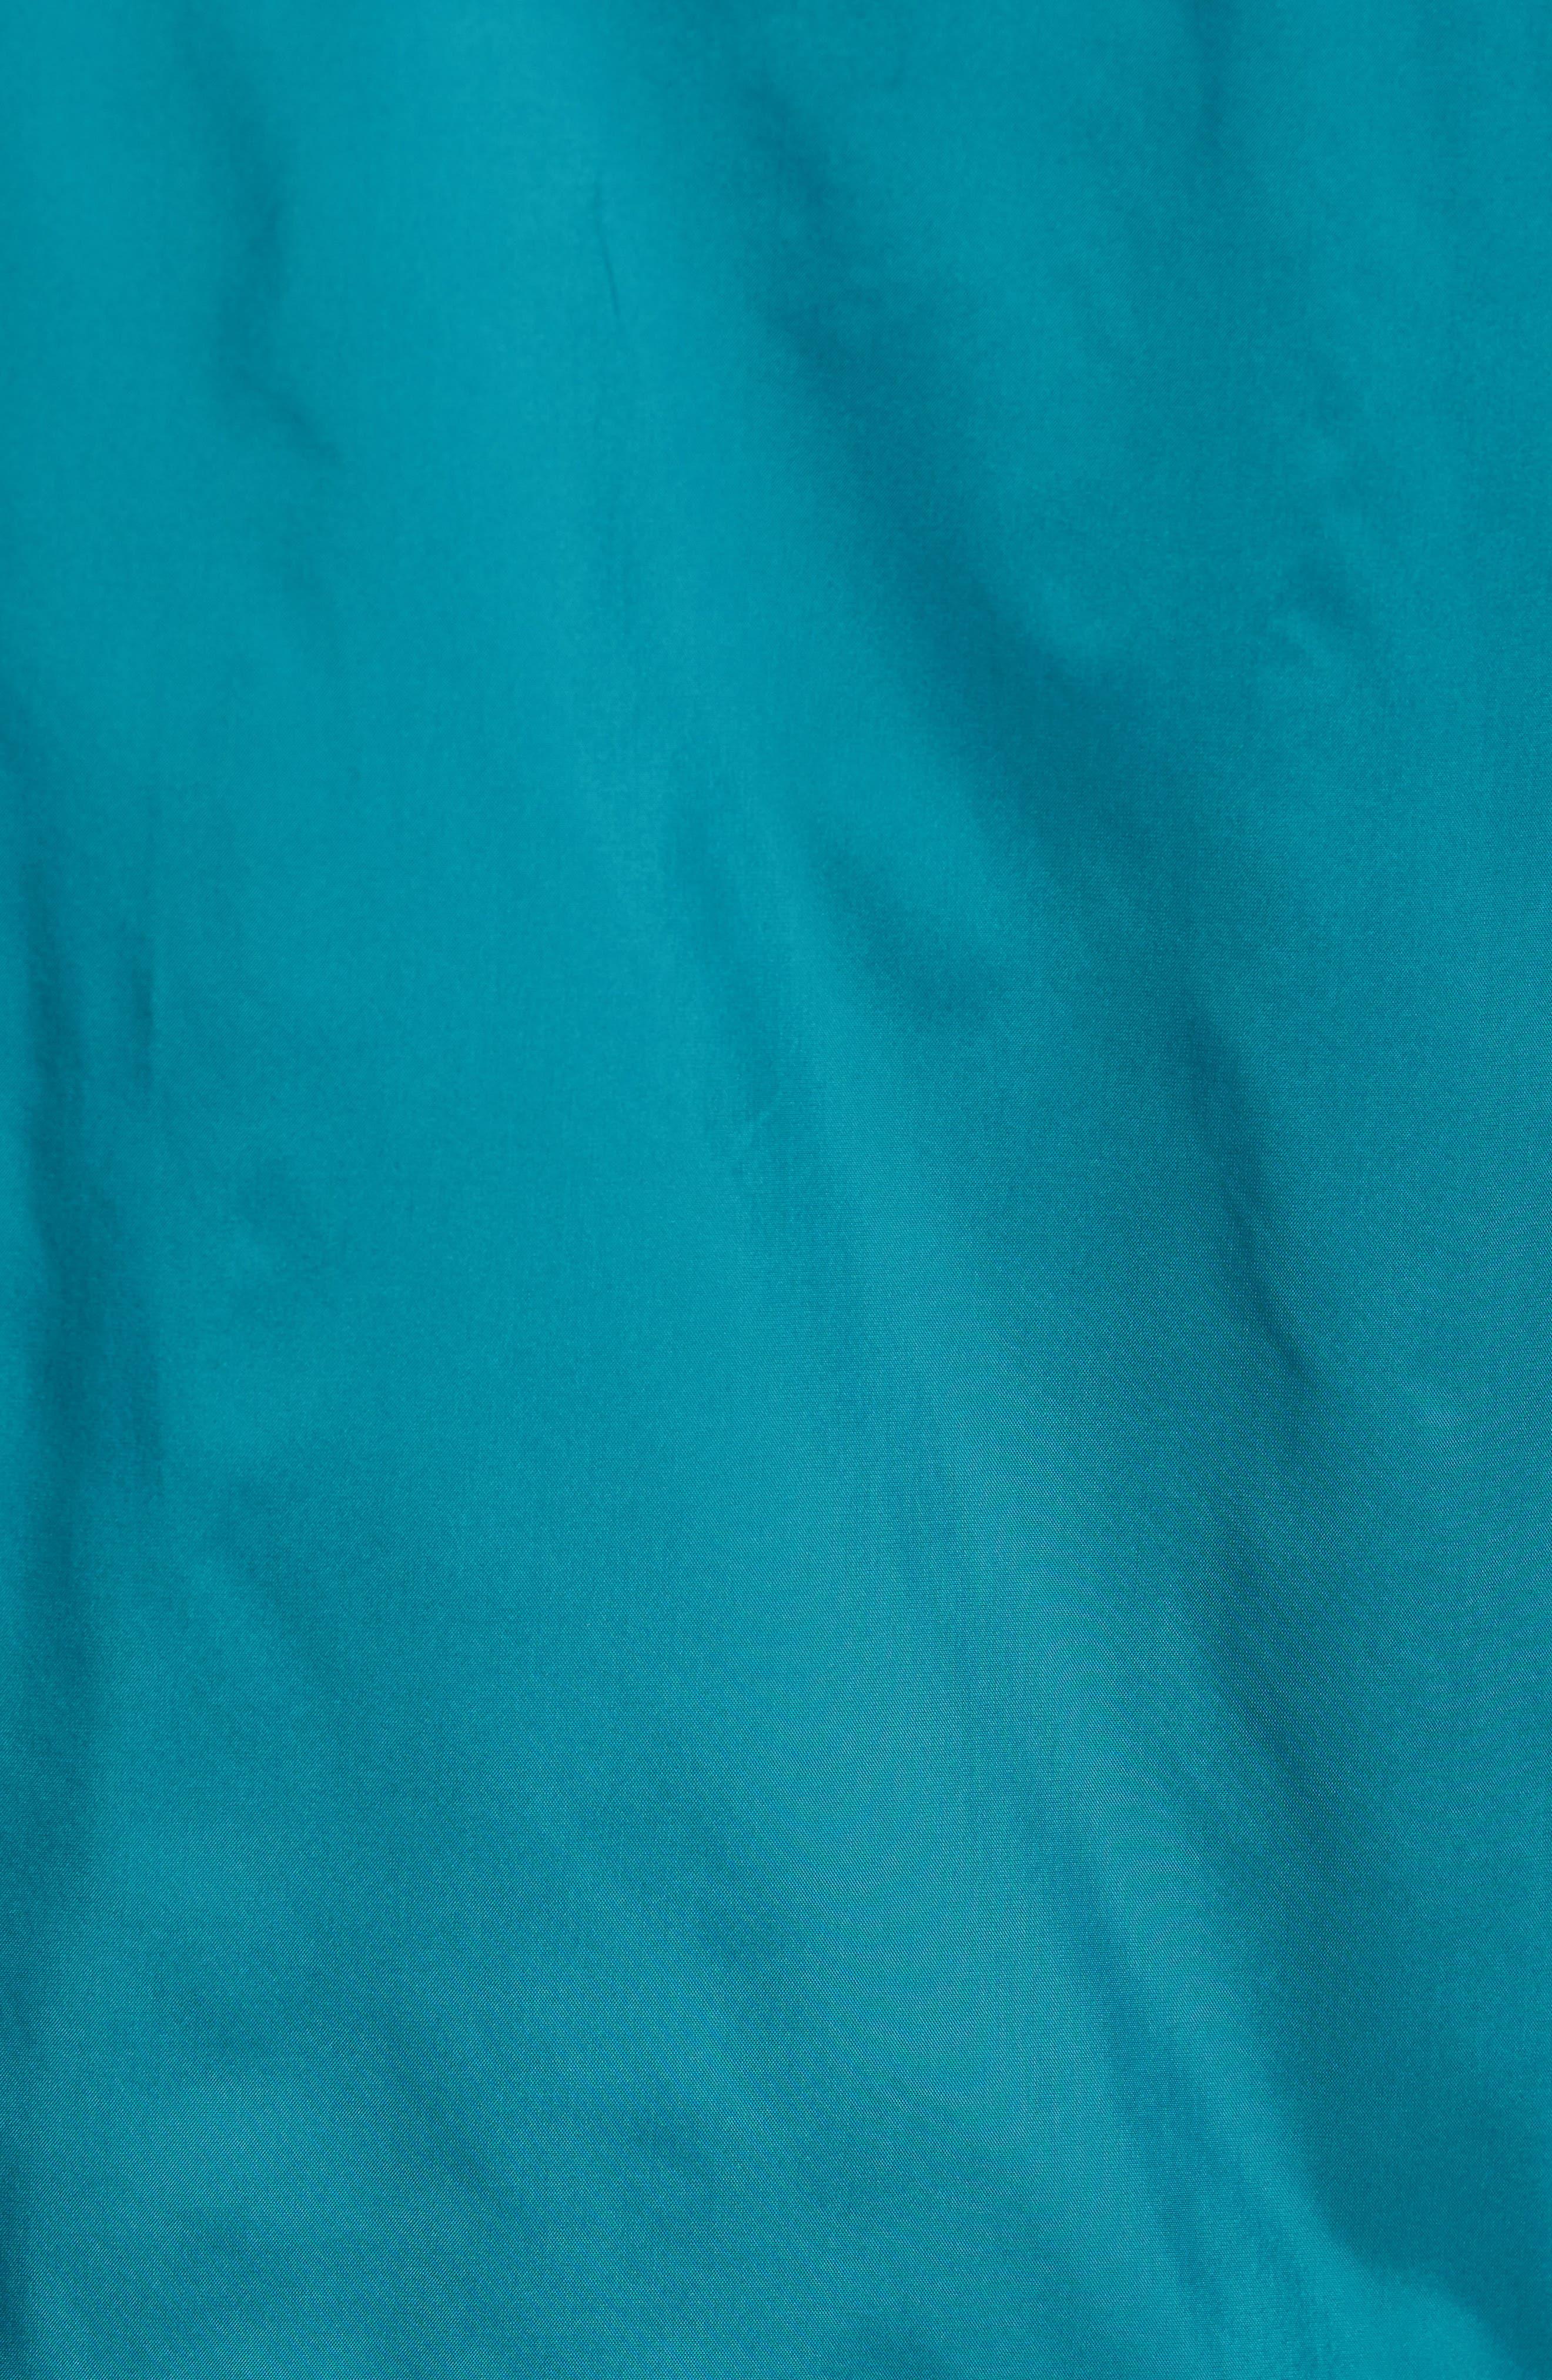 Eyes Coaches Jacket,                             Alternate thumbnail 5, color,                             Teal